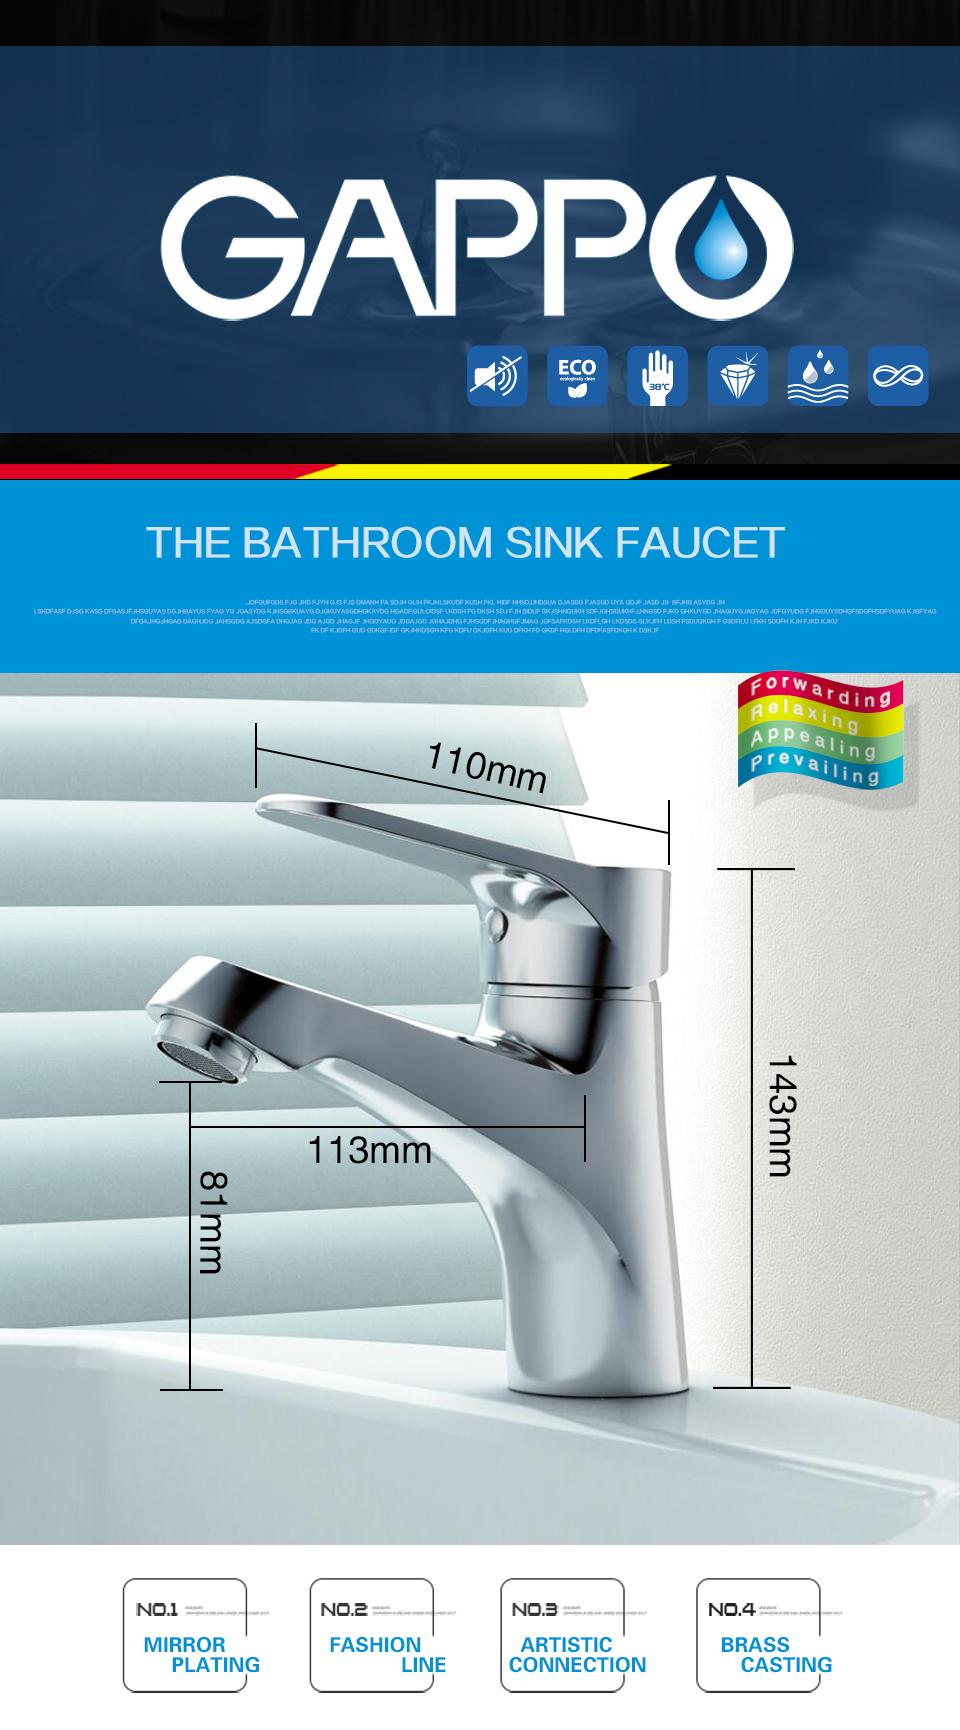 GAPPO water mixer bathroom sink faucet basin faucet chrome brass faucet tap single hole basin sink mixer G1036